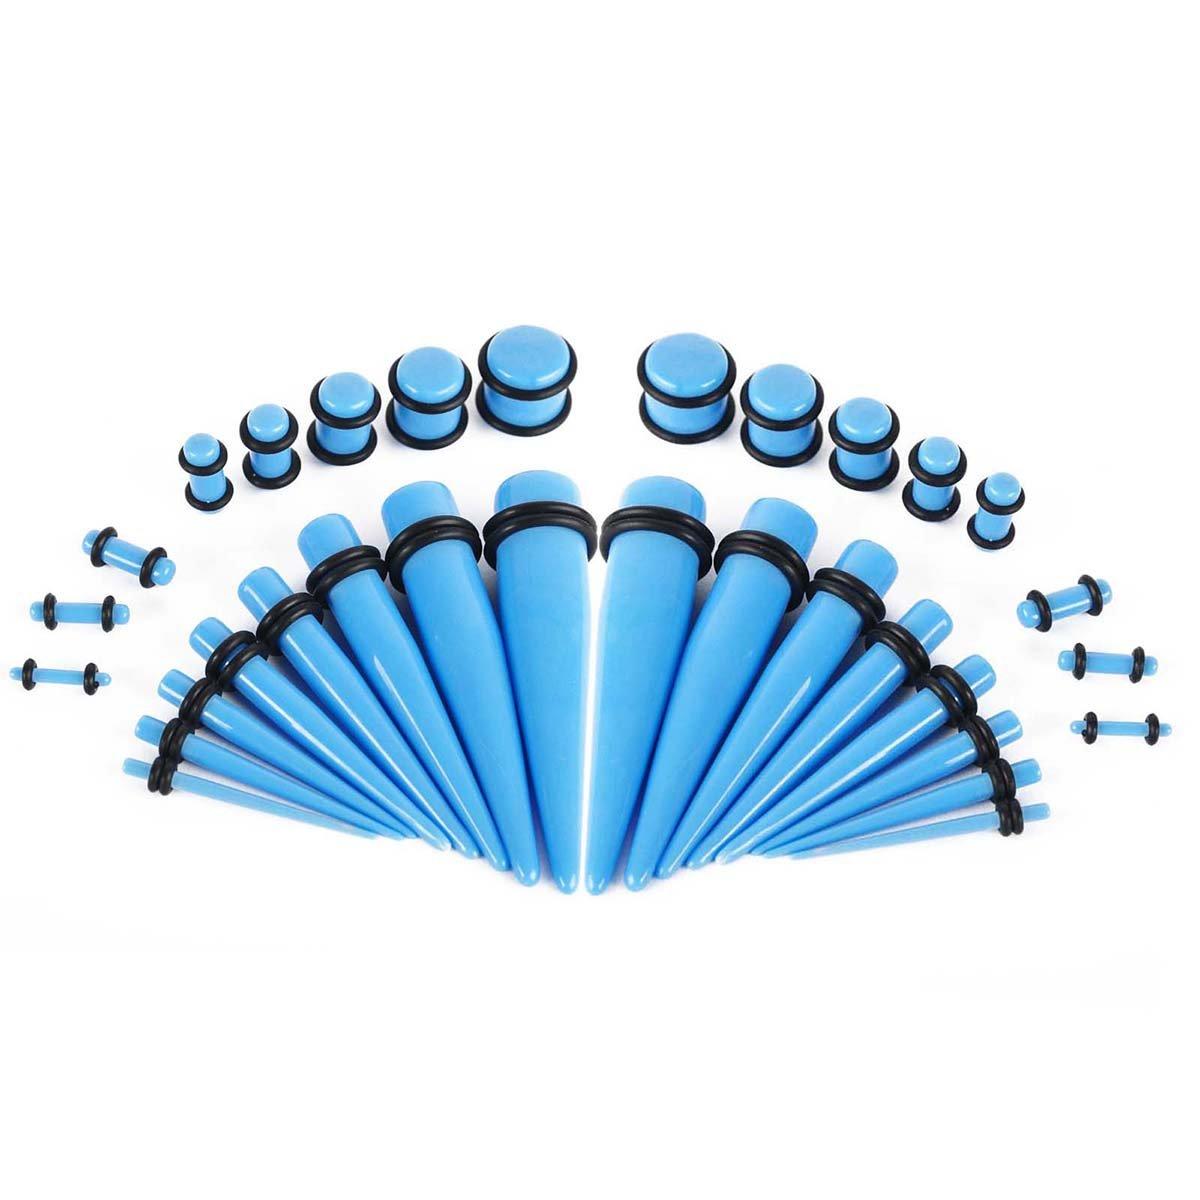 iDealhere 32pcs Acrílico Ahusamientos Piercing Tapones Túnel Oído Calibres Expansor Estirar kit (azul): Amazon.es: Hogar